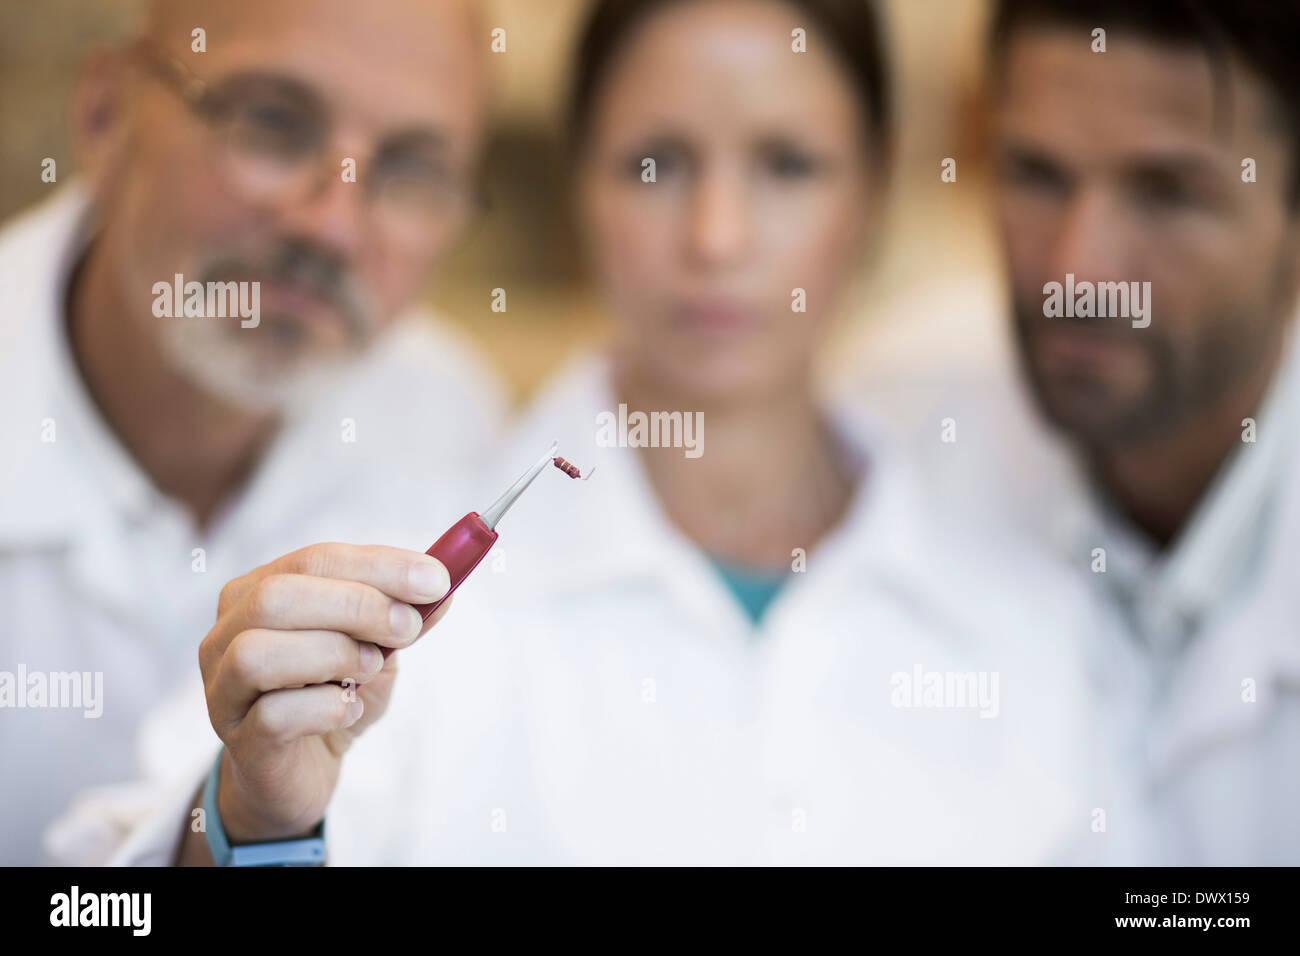 Engineers looking at resistor in manufacturing industry - Stock Image